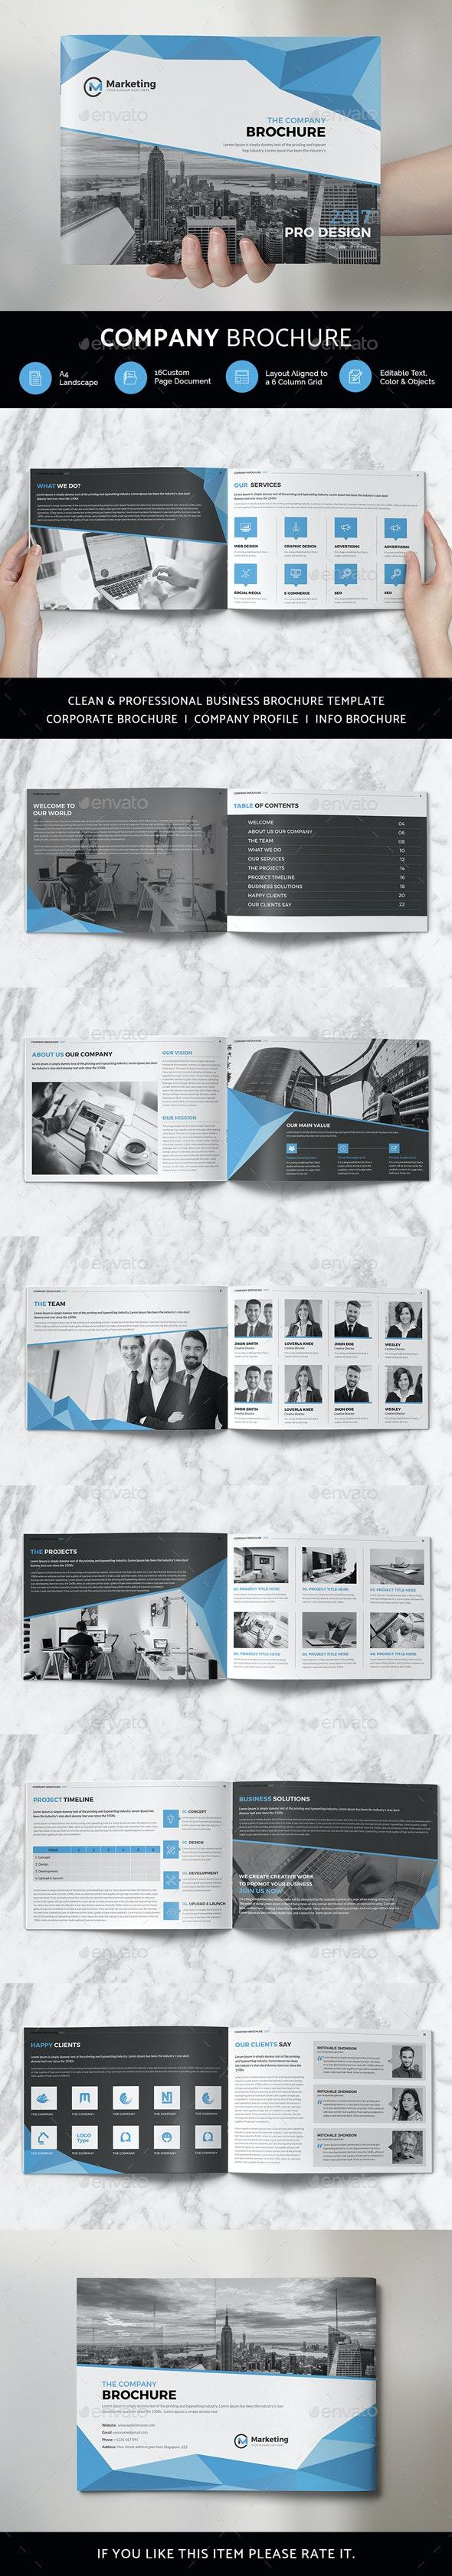 Company Brochure - Print Templates